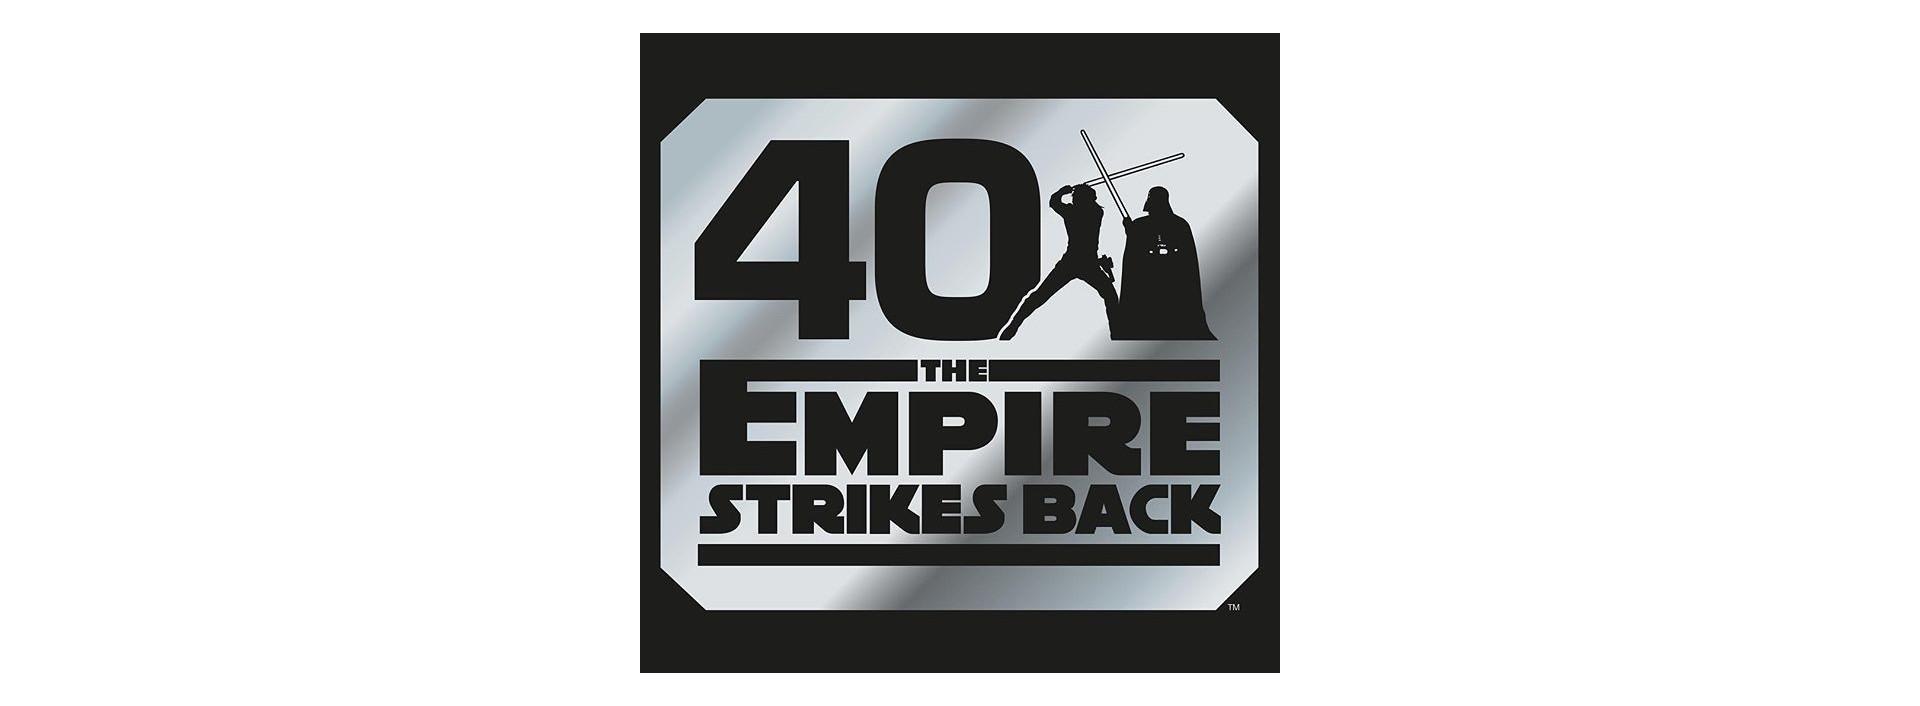 40 THE EMPIRE STRIKES BACK